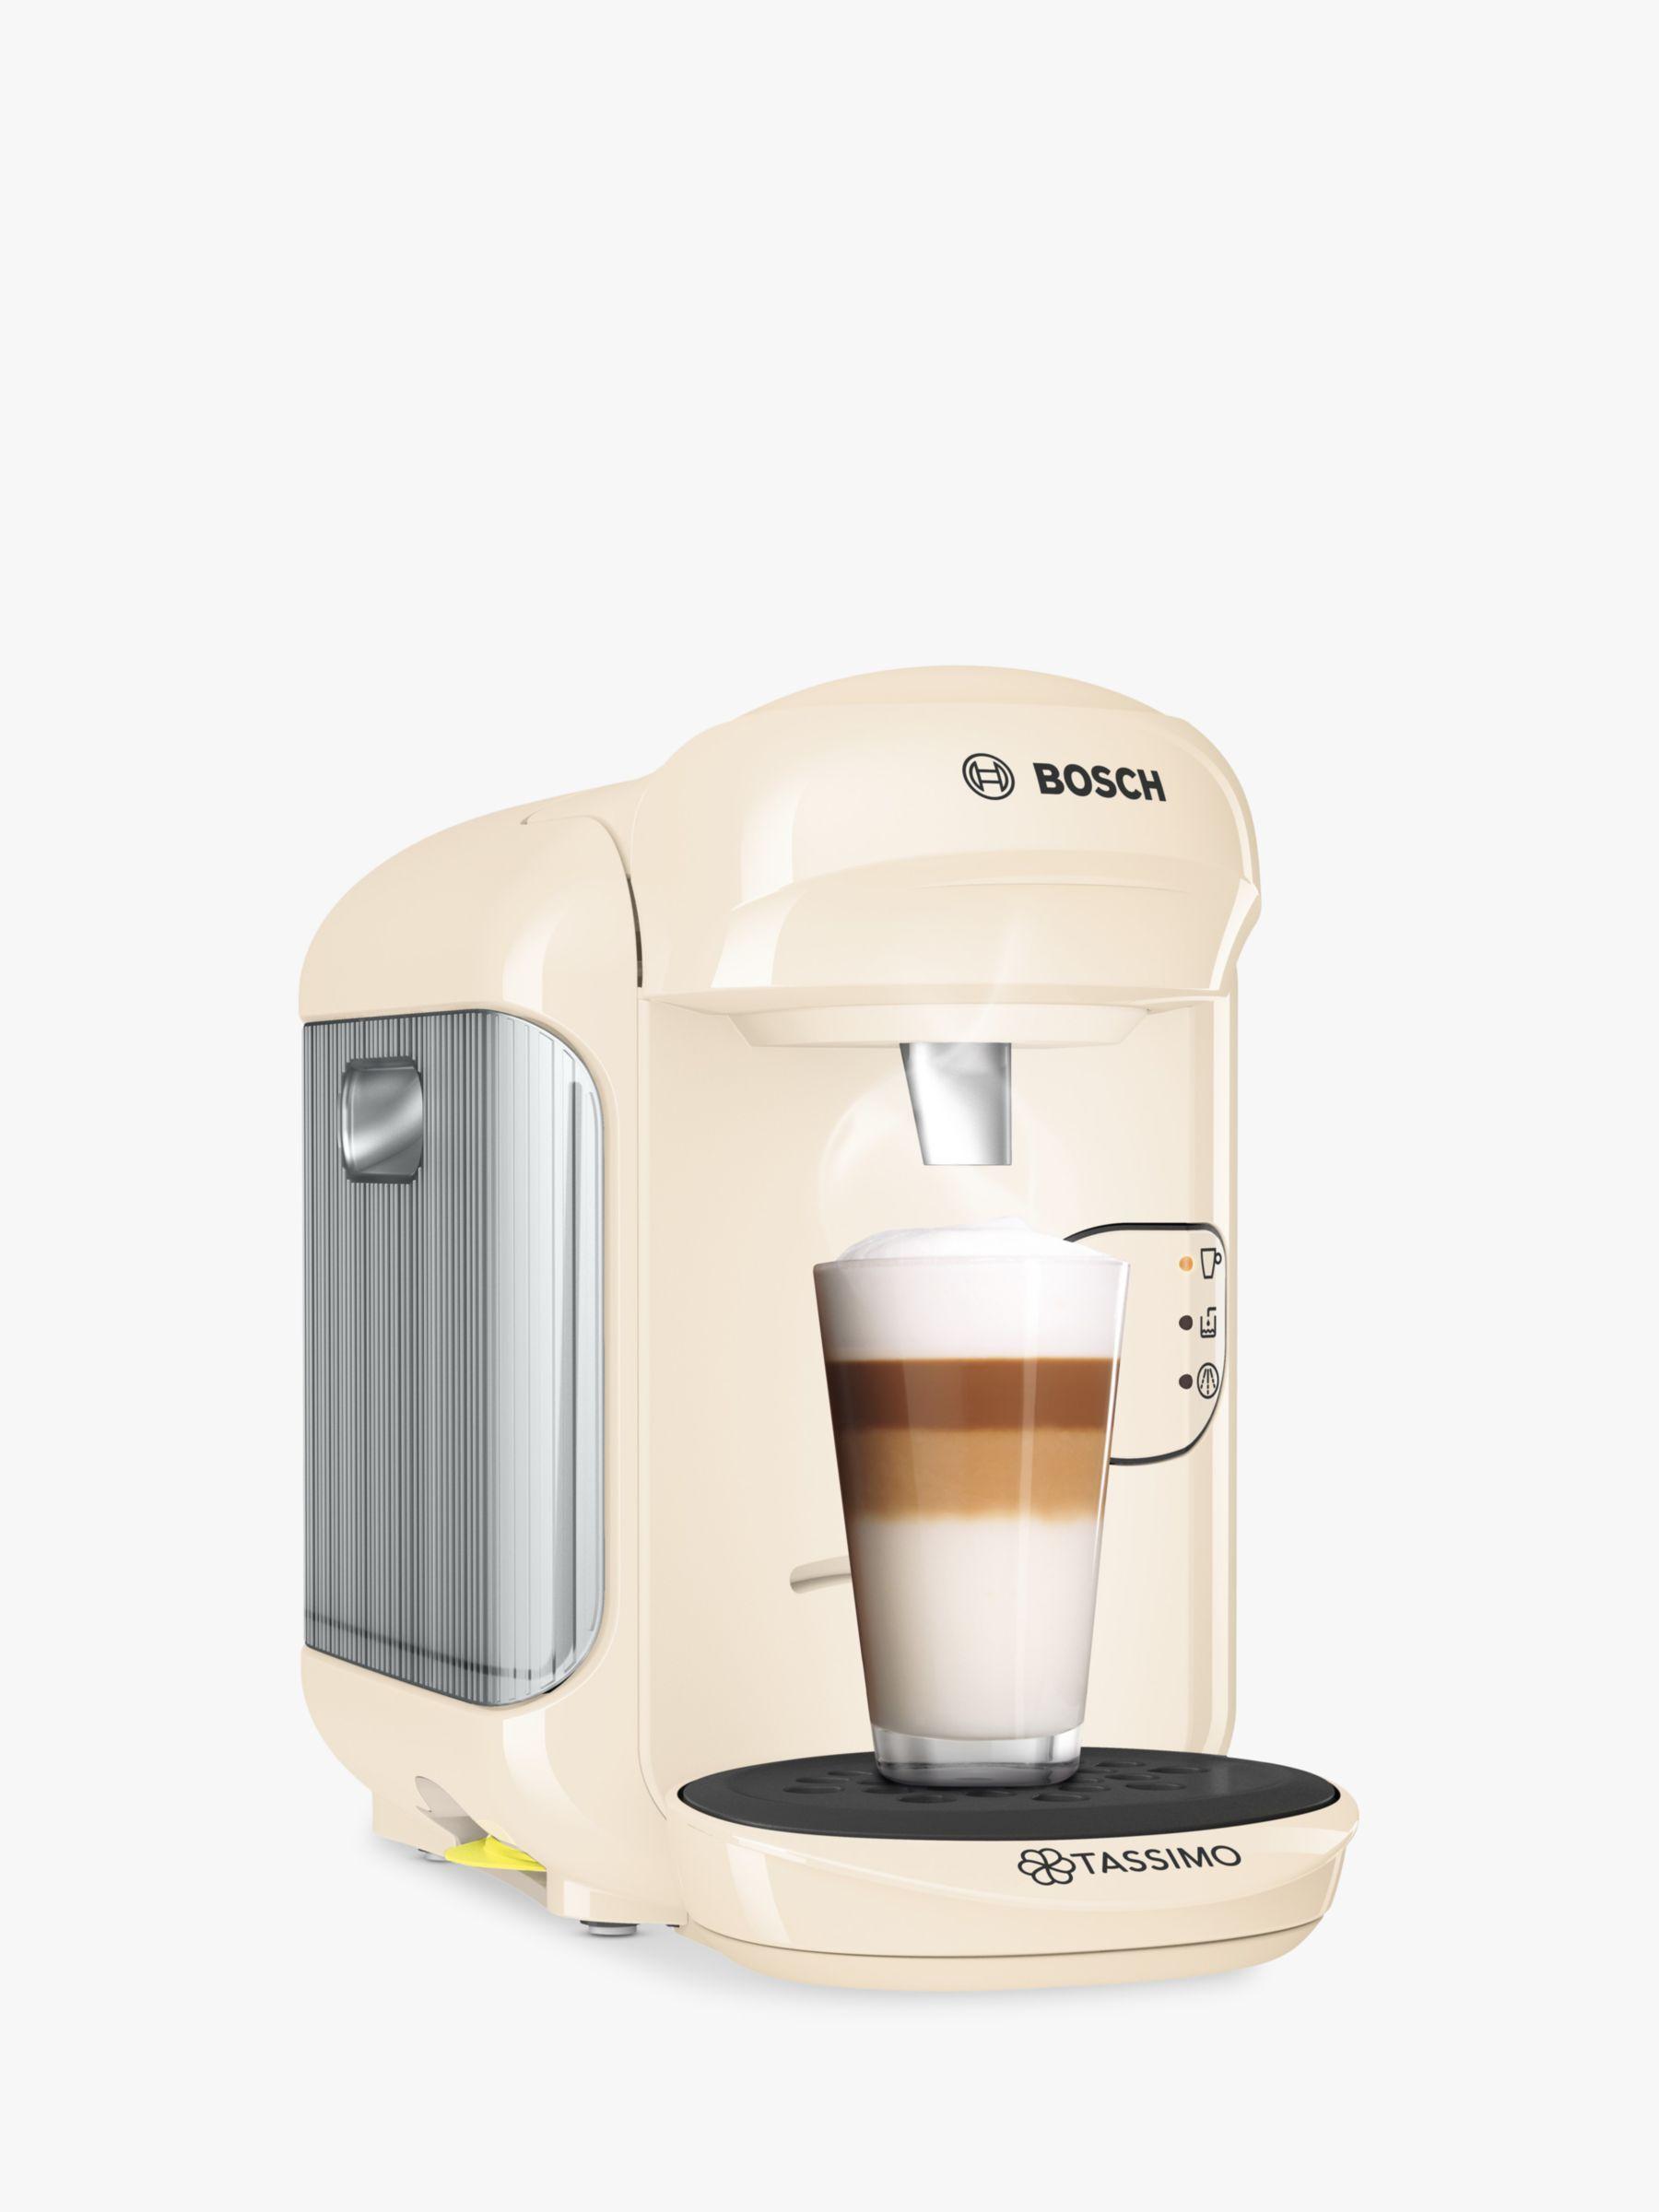 Tassimo Vivy Coffee Machine by Bosch, Cream Home coffee